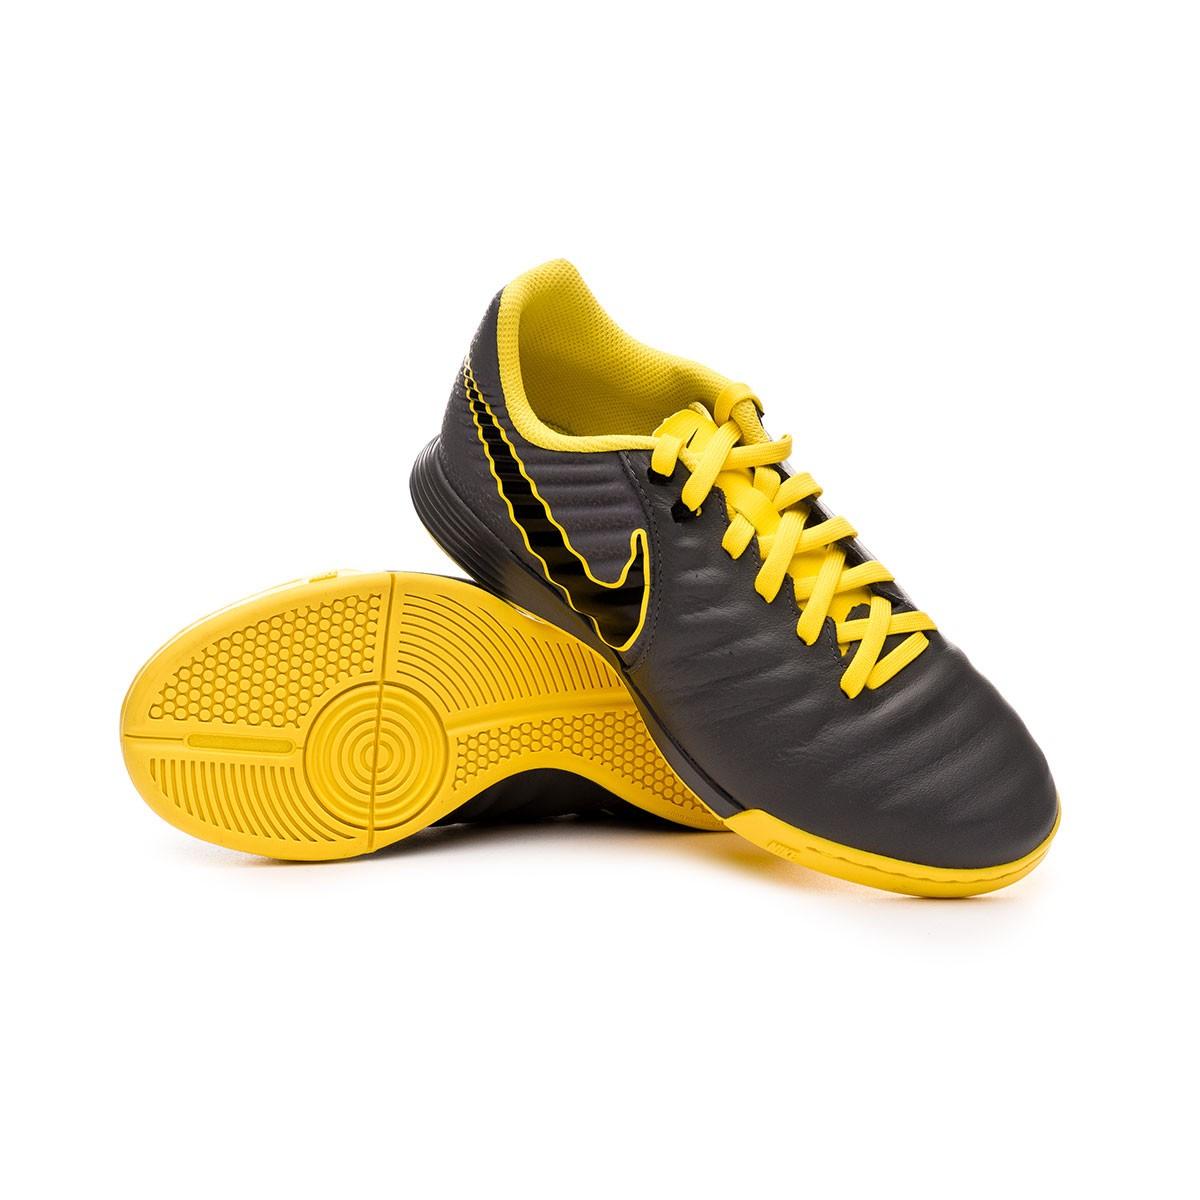 cheap for discount 774ac 81fce Zapatilla Tiempo LegendX VII Academy IC Niño Dark grey-Black-Optical yellow